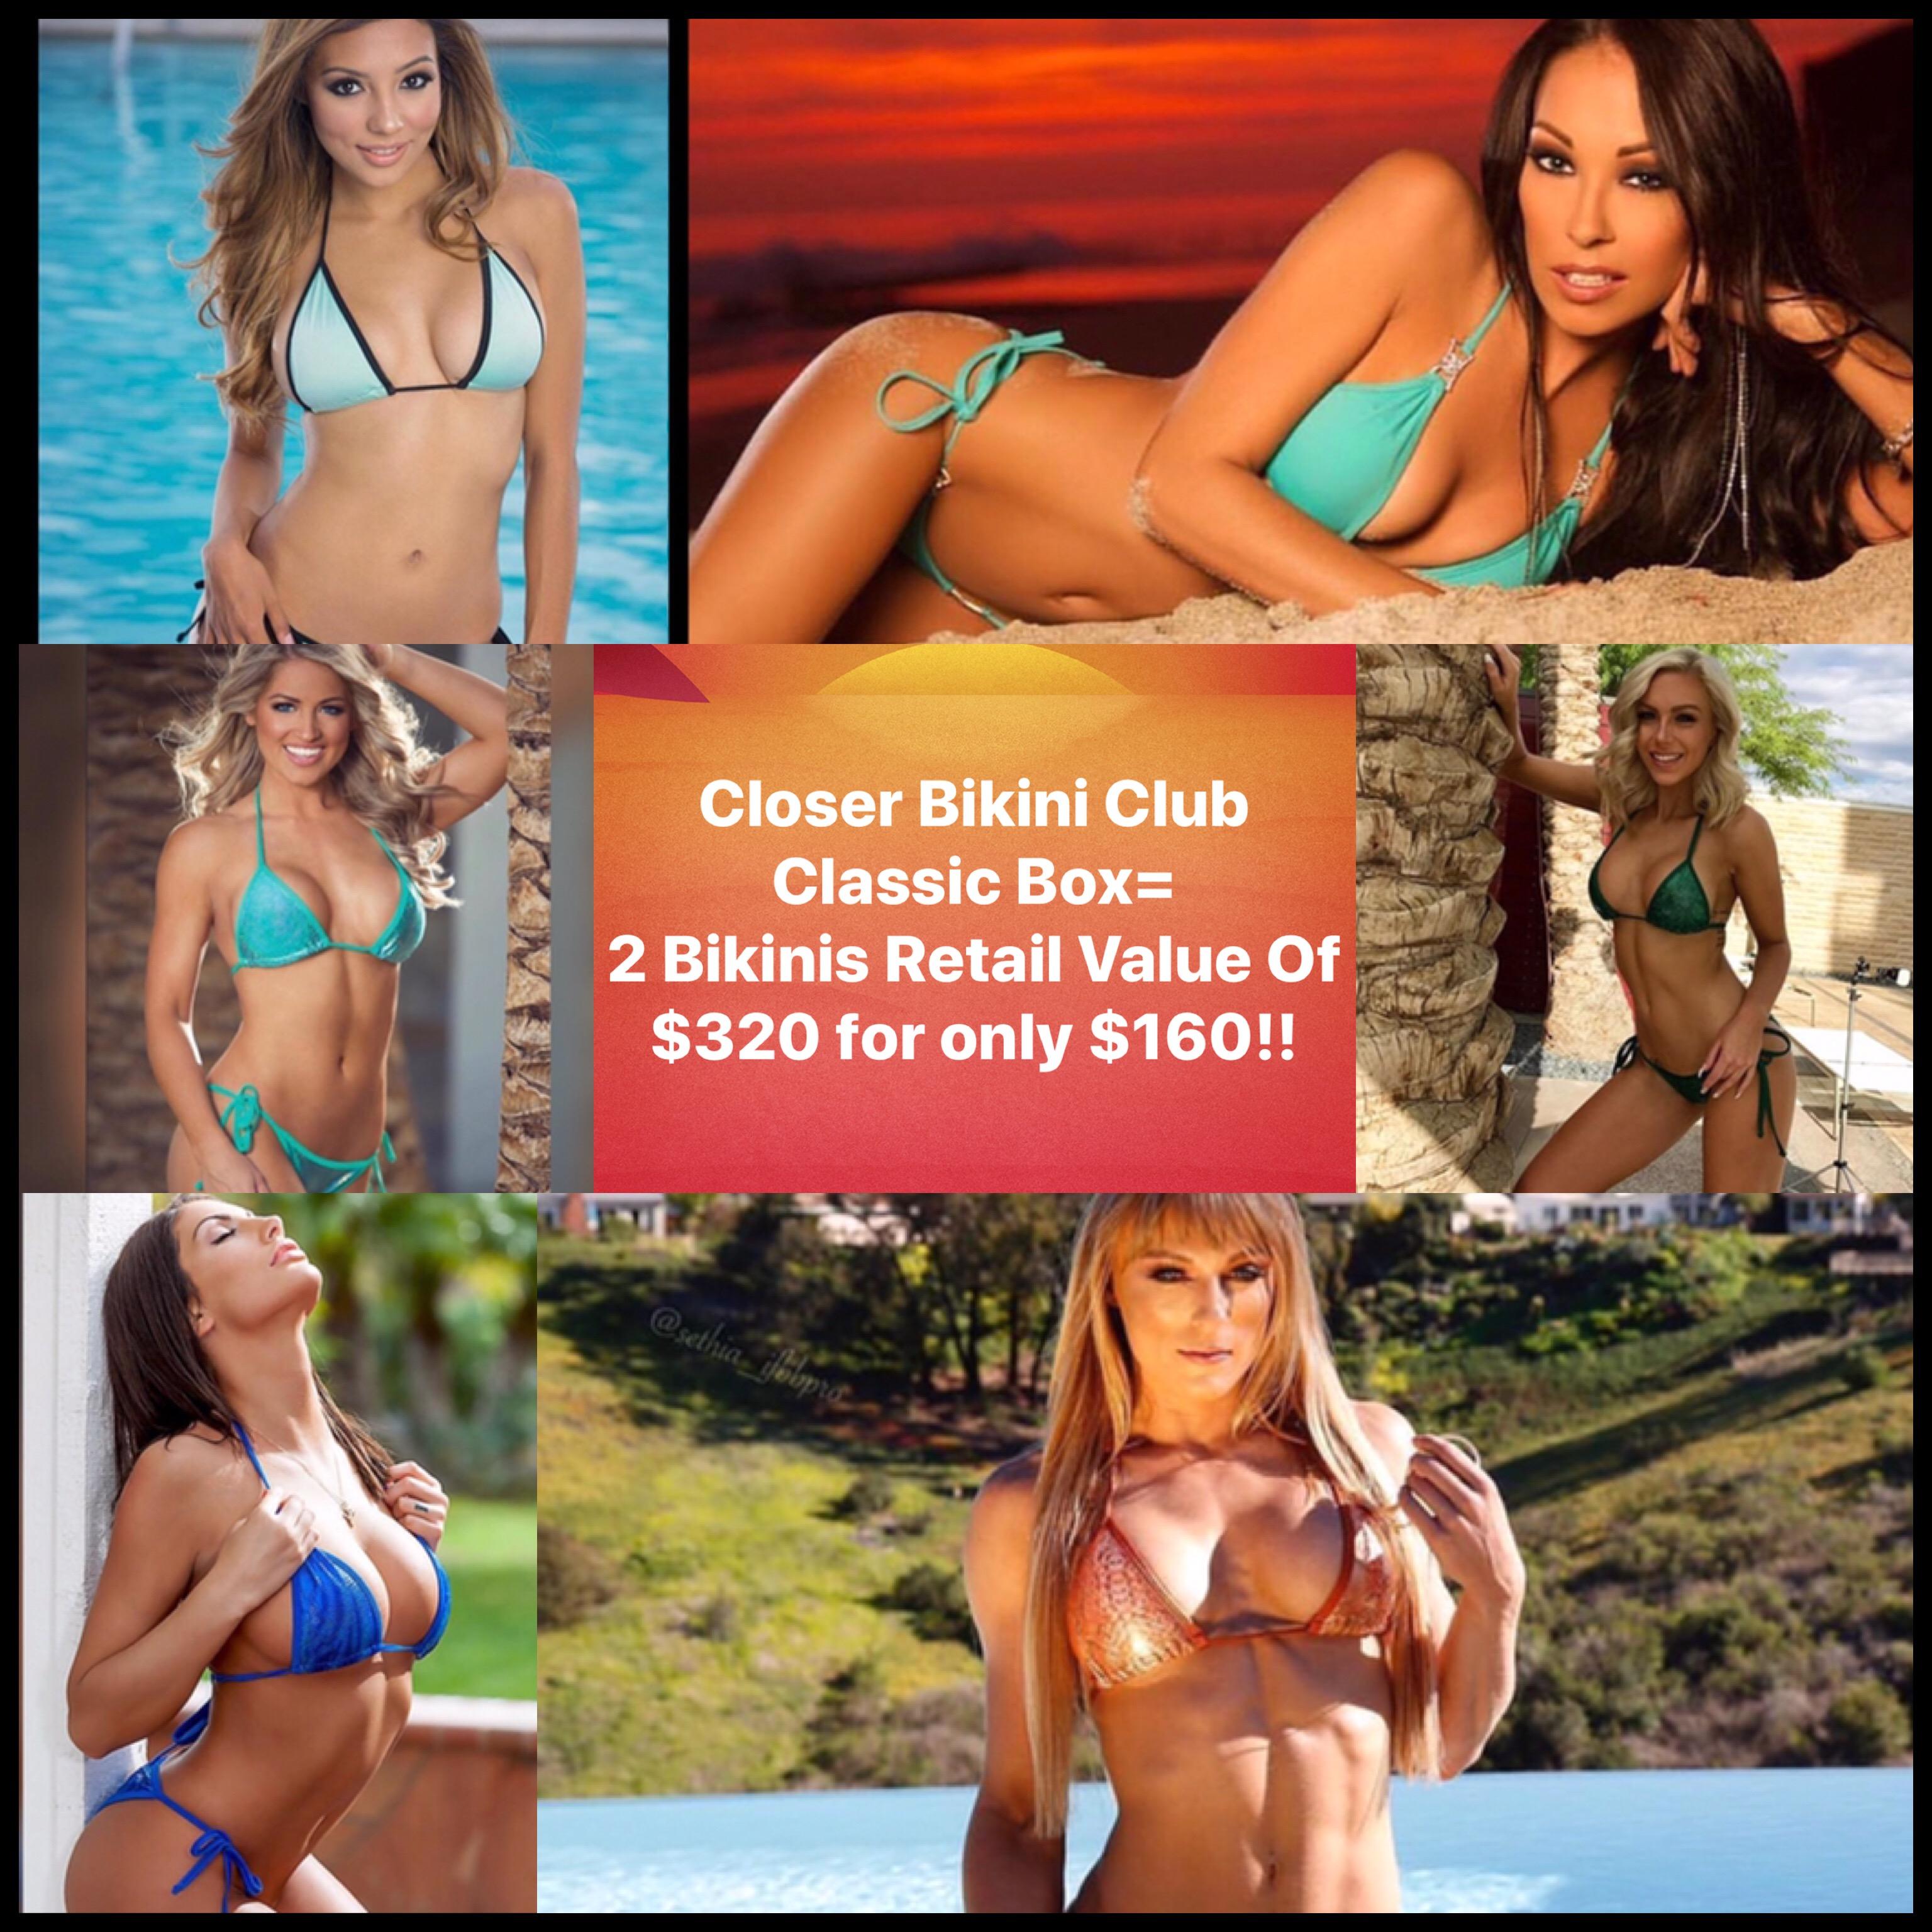 Bikini club coverage event photo